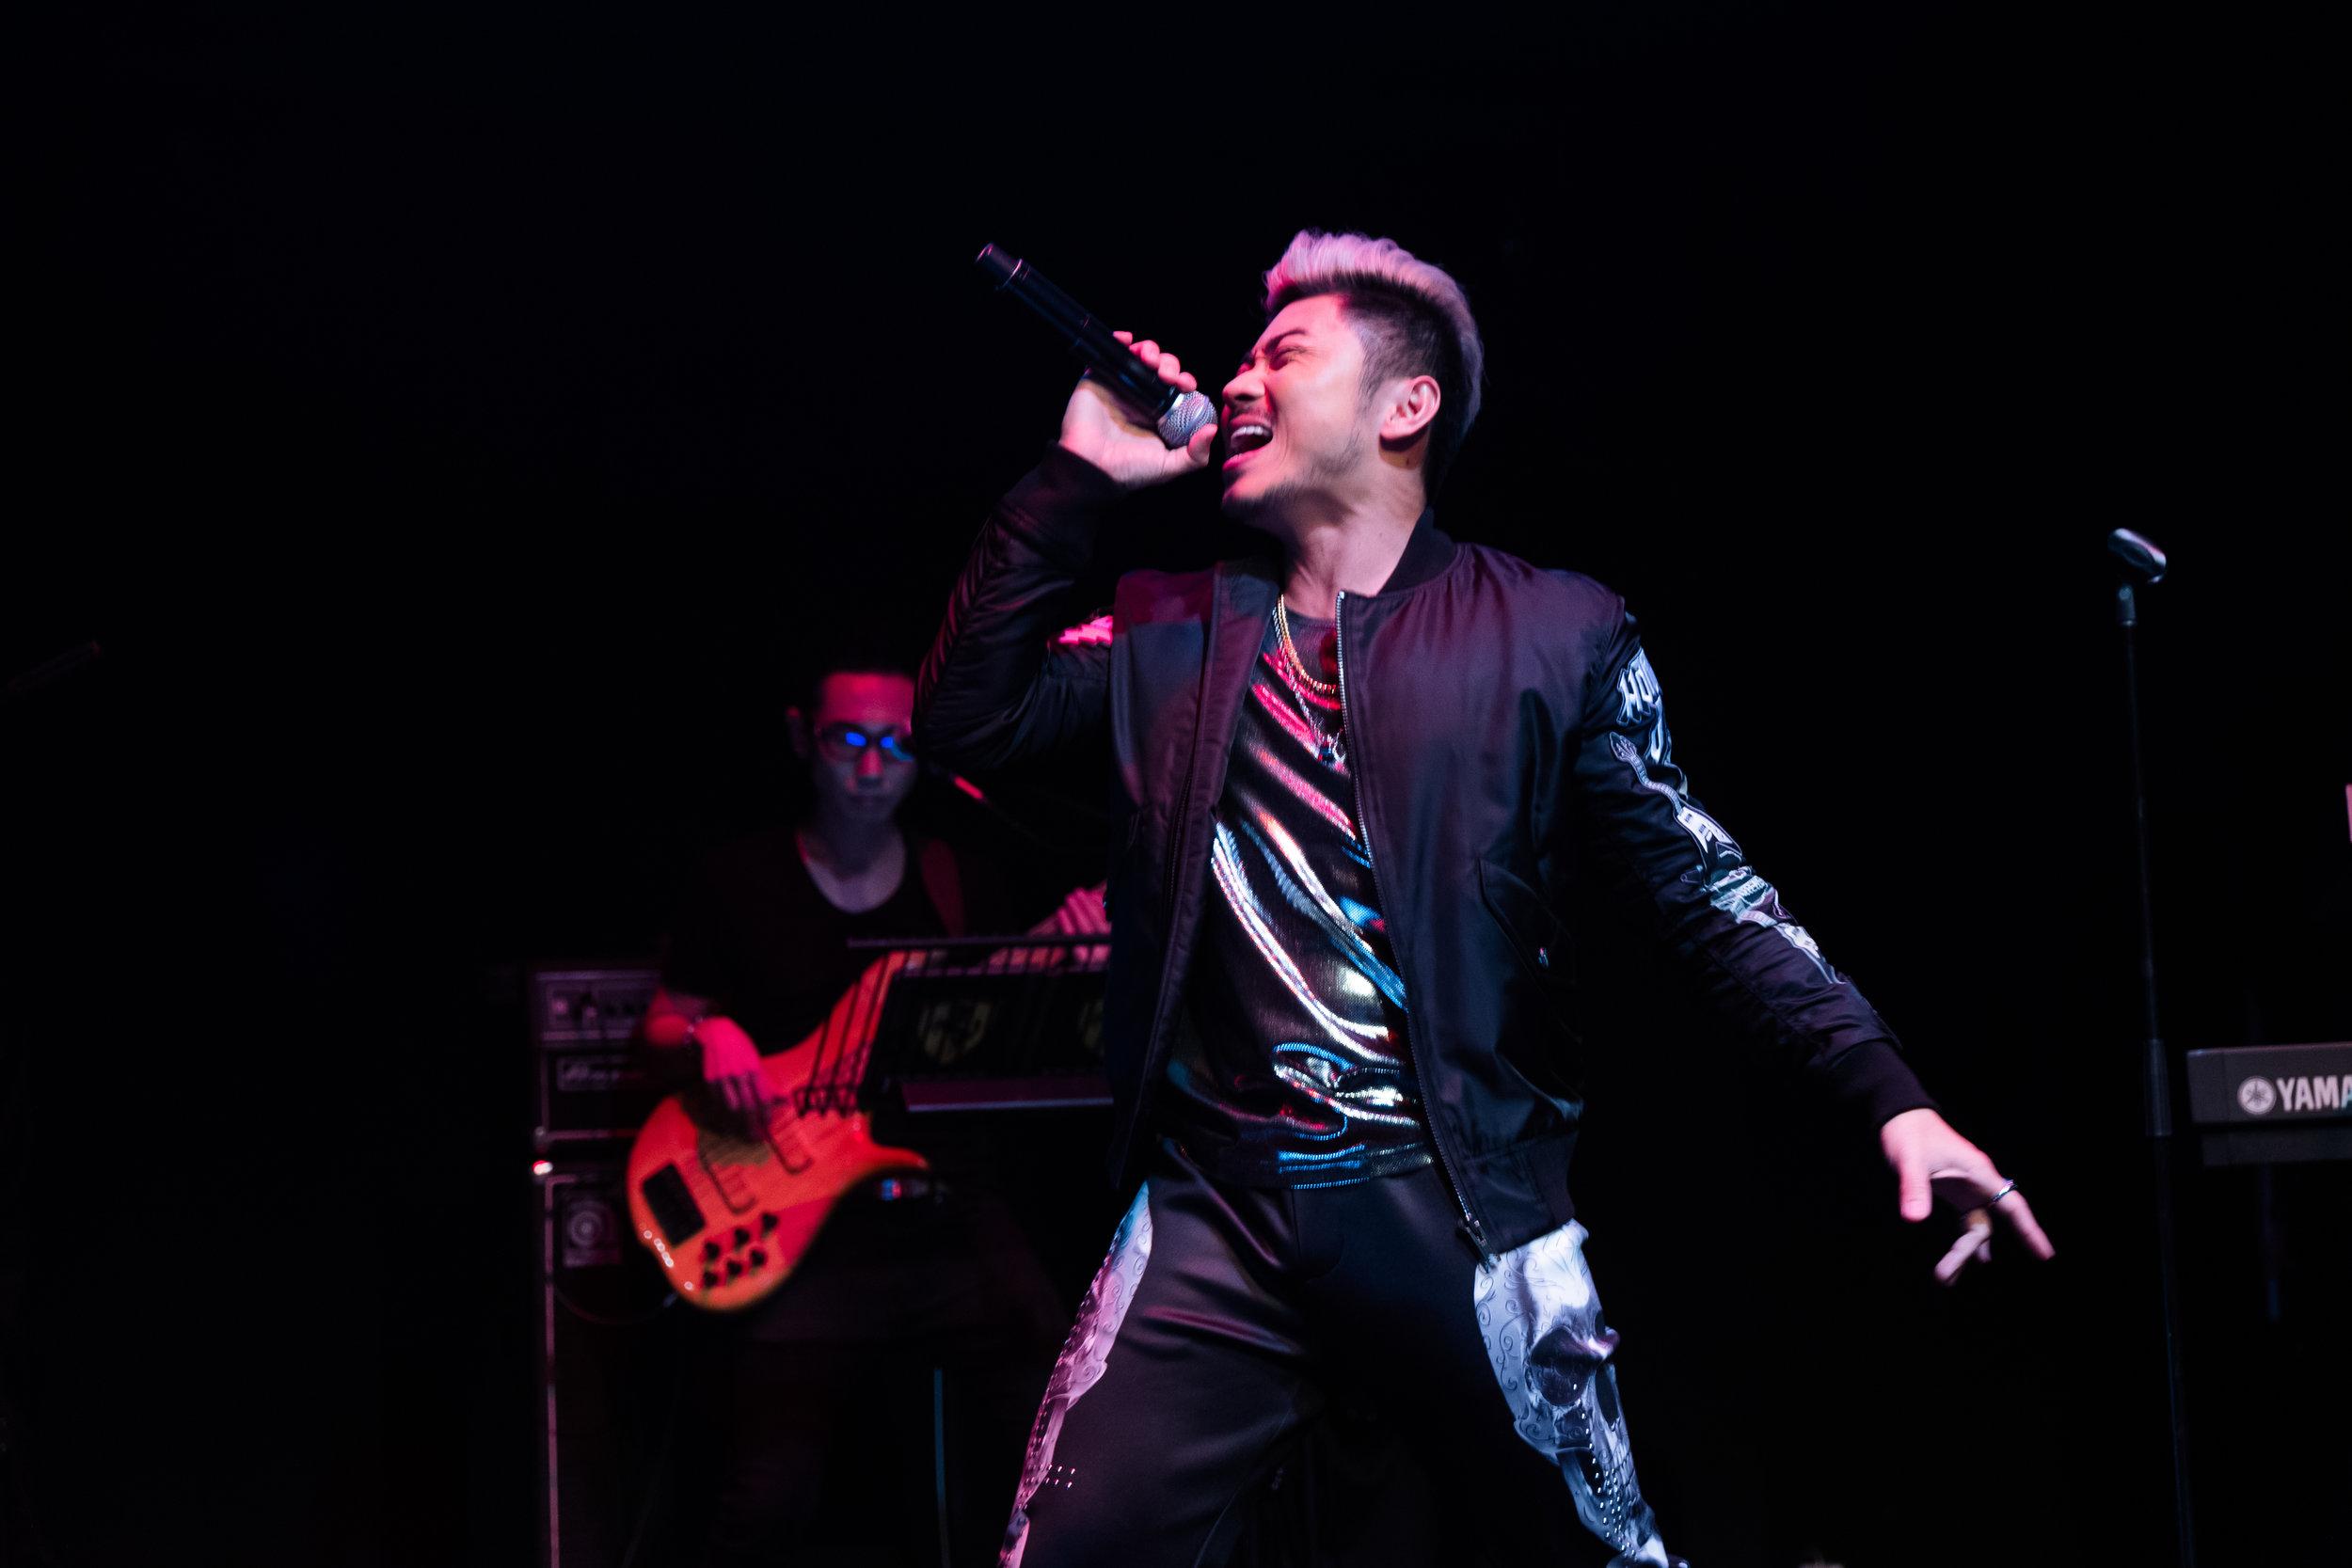 Photo by: Cross Ratio Entertainment / Trigram Media